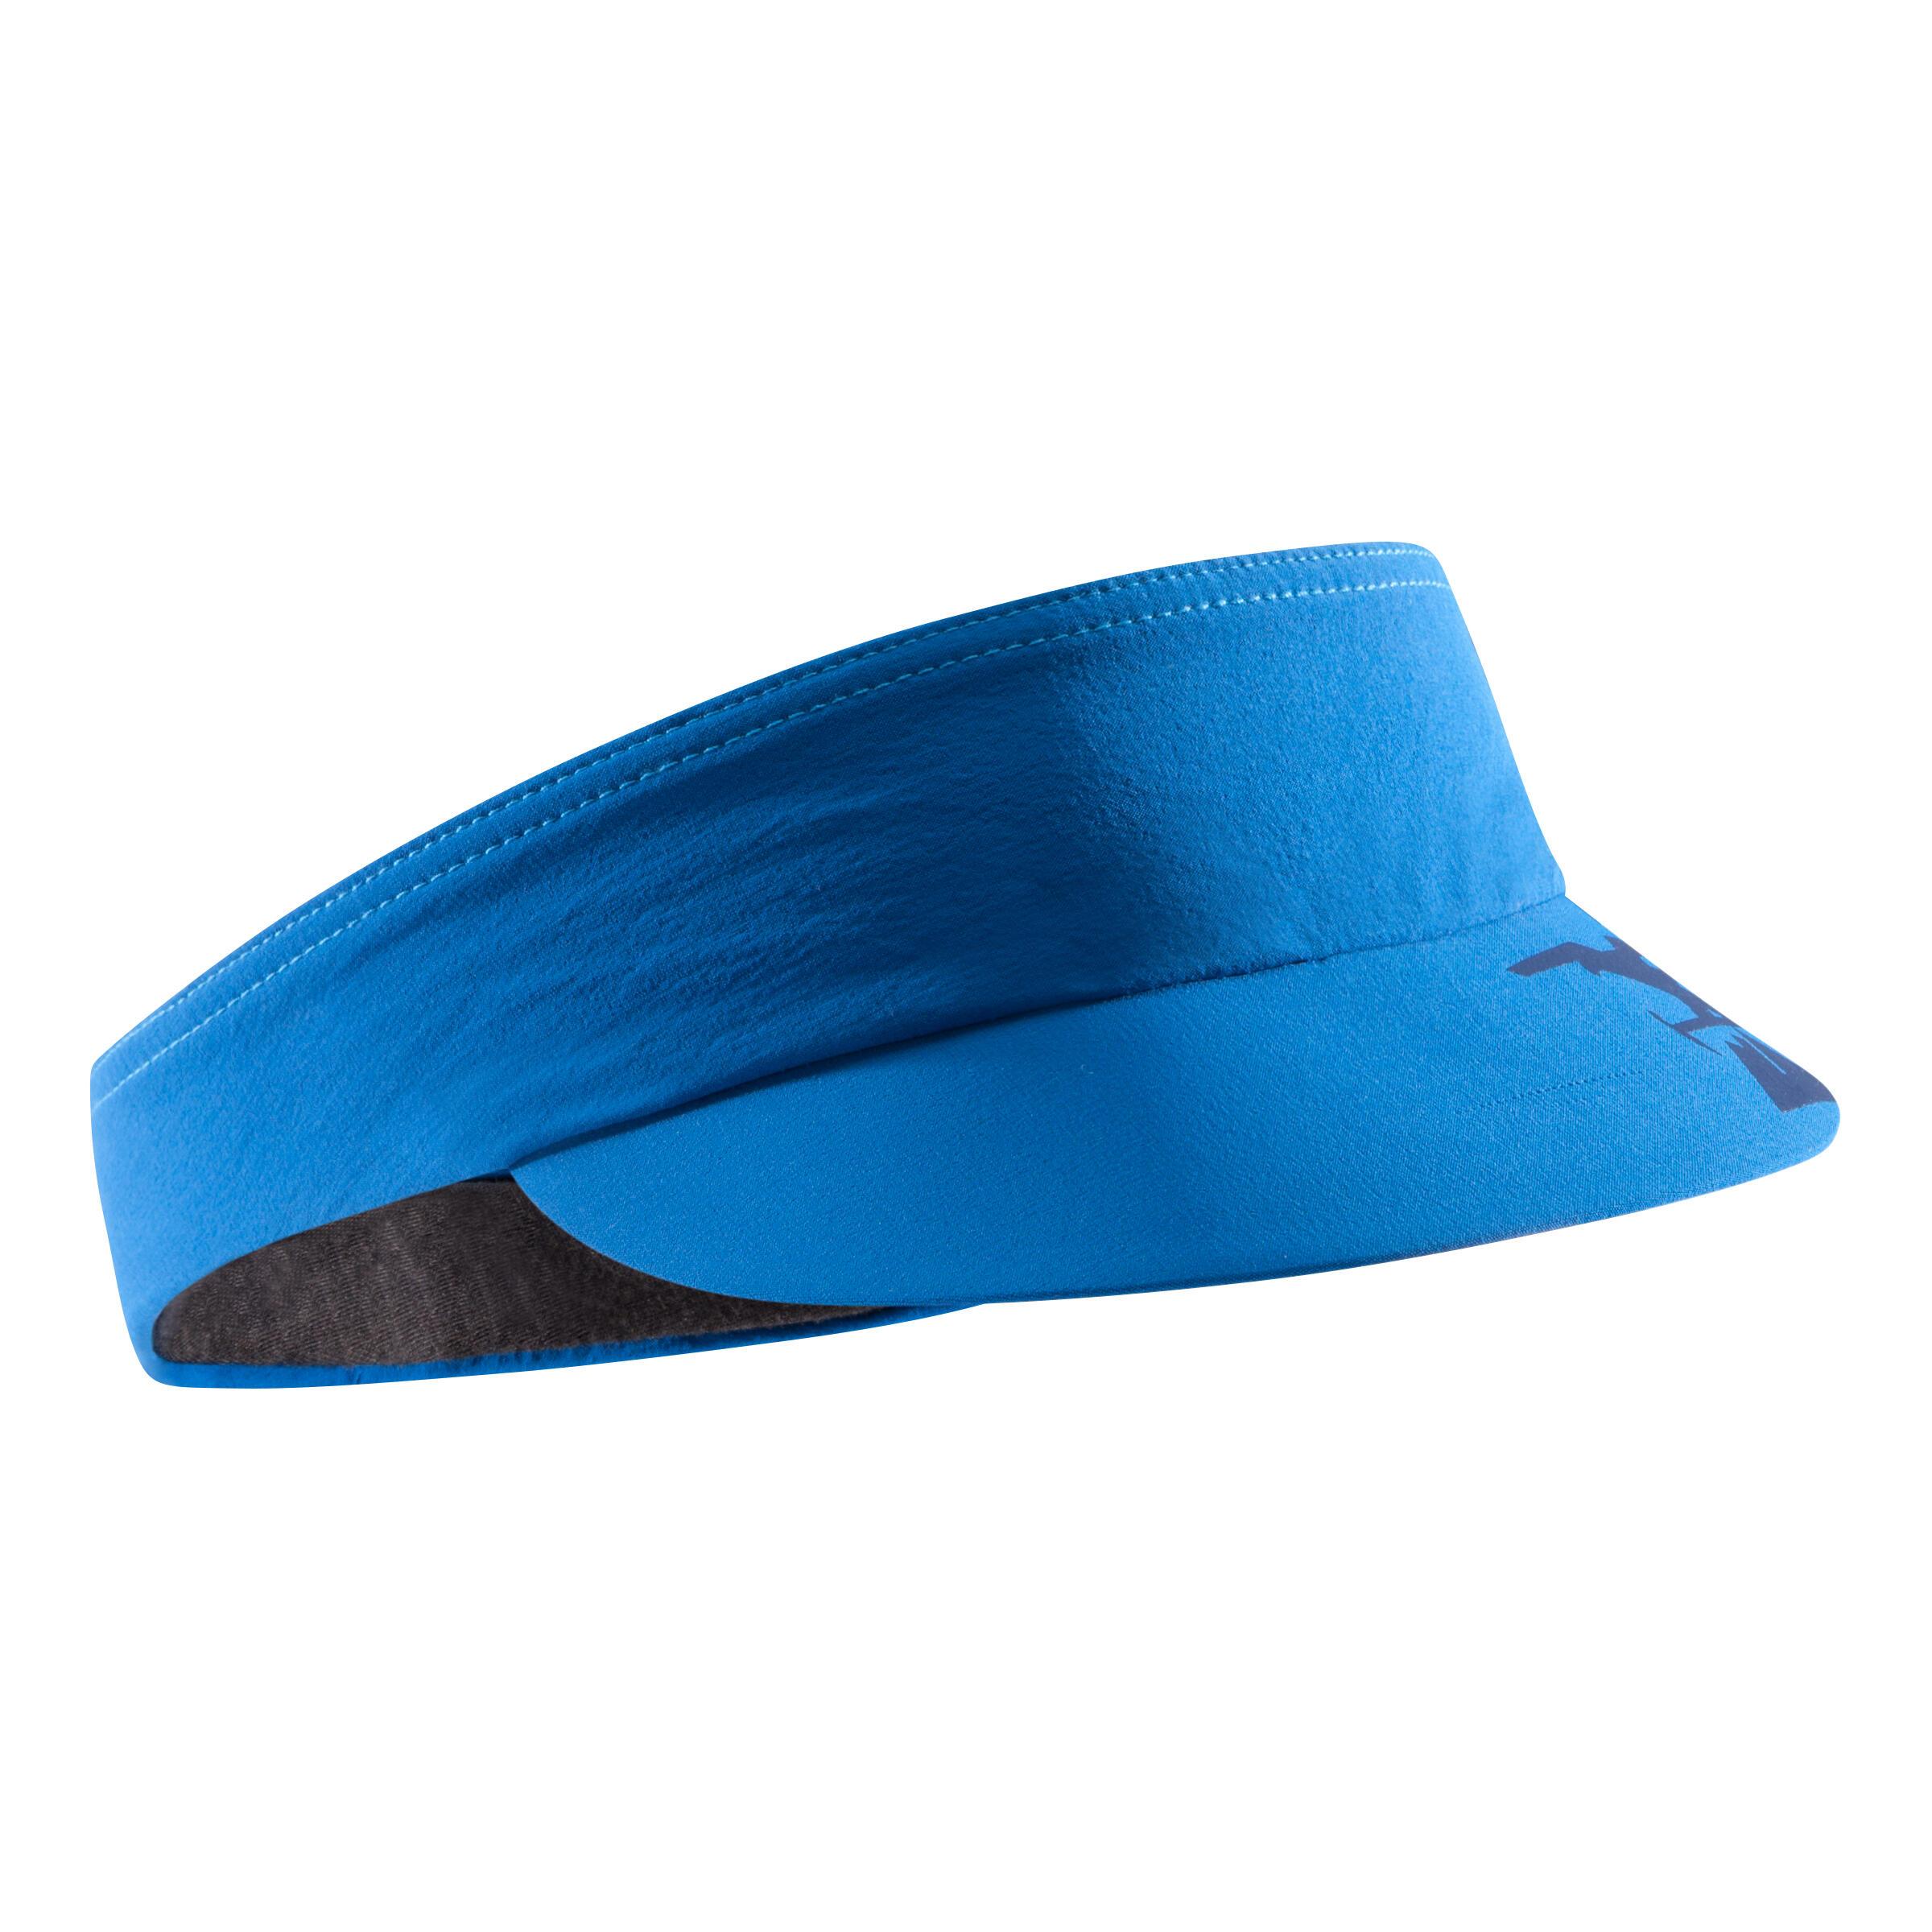 ALPI Visor - Electric Blue